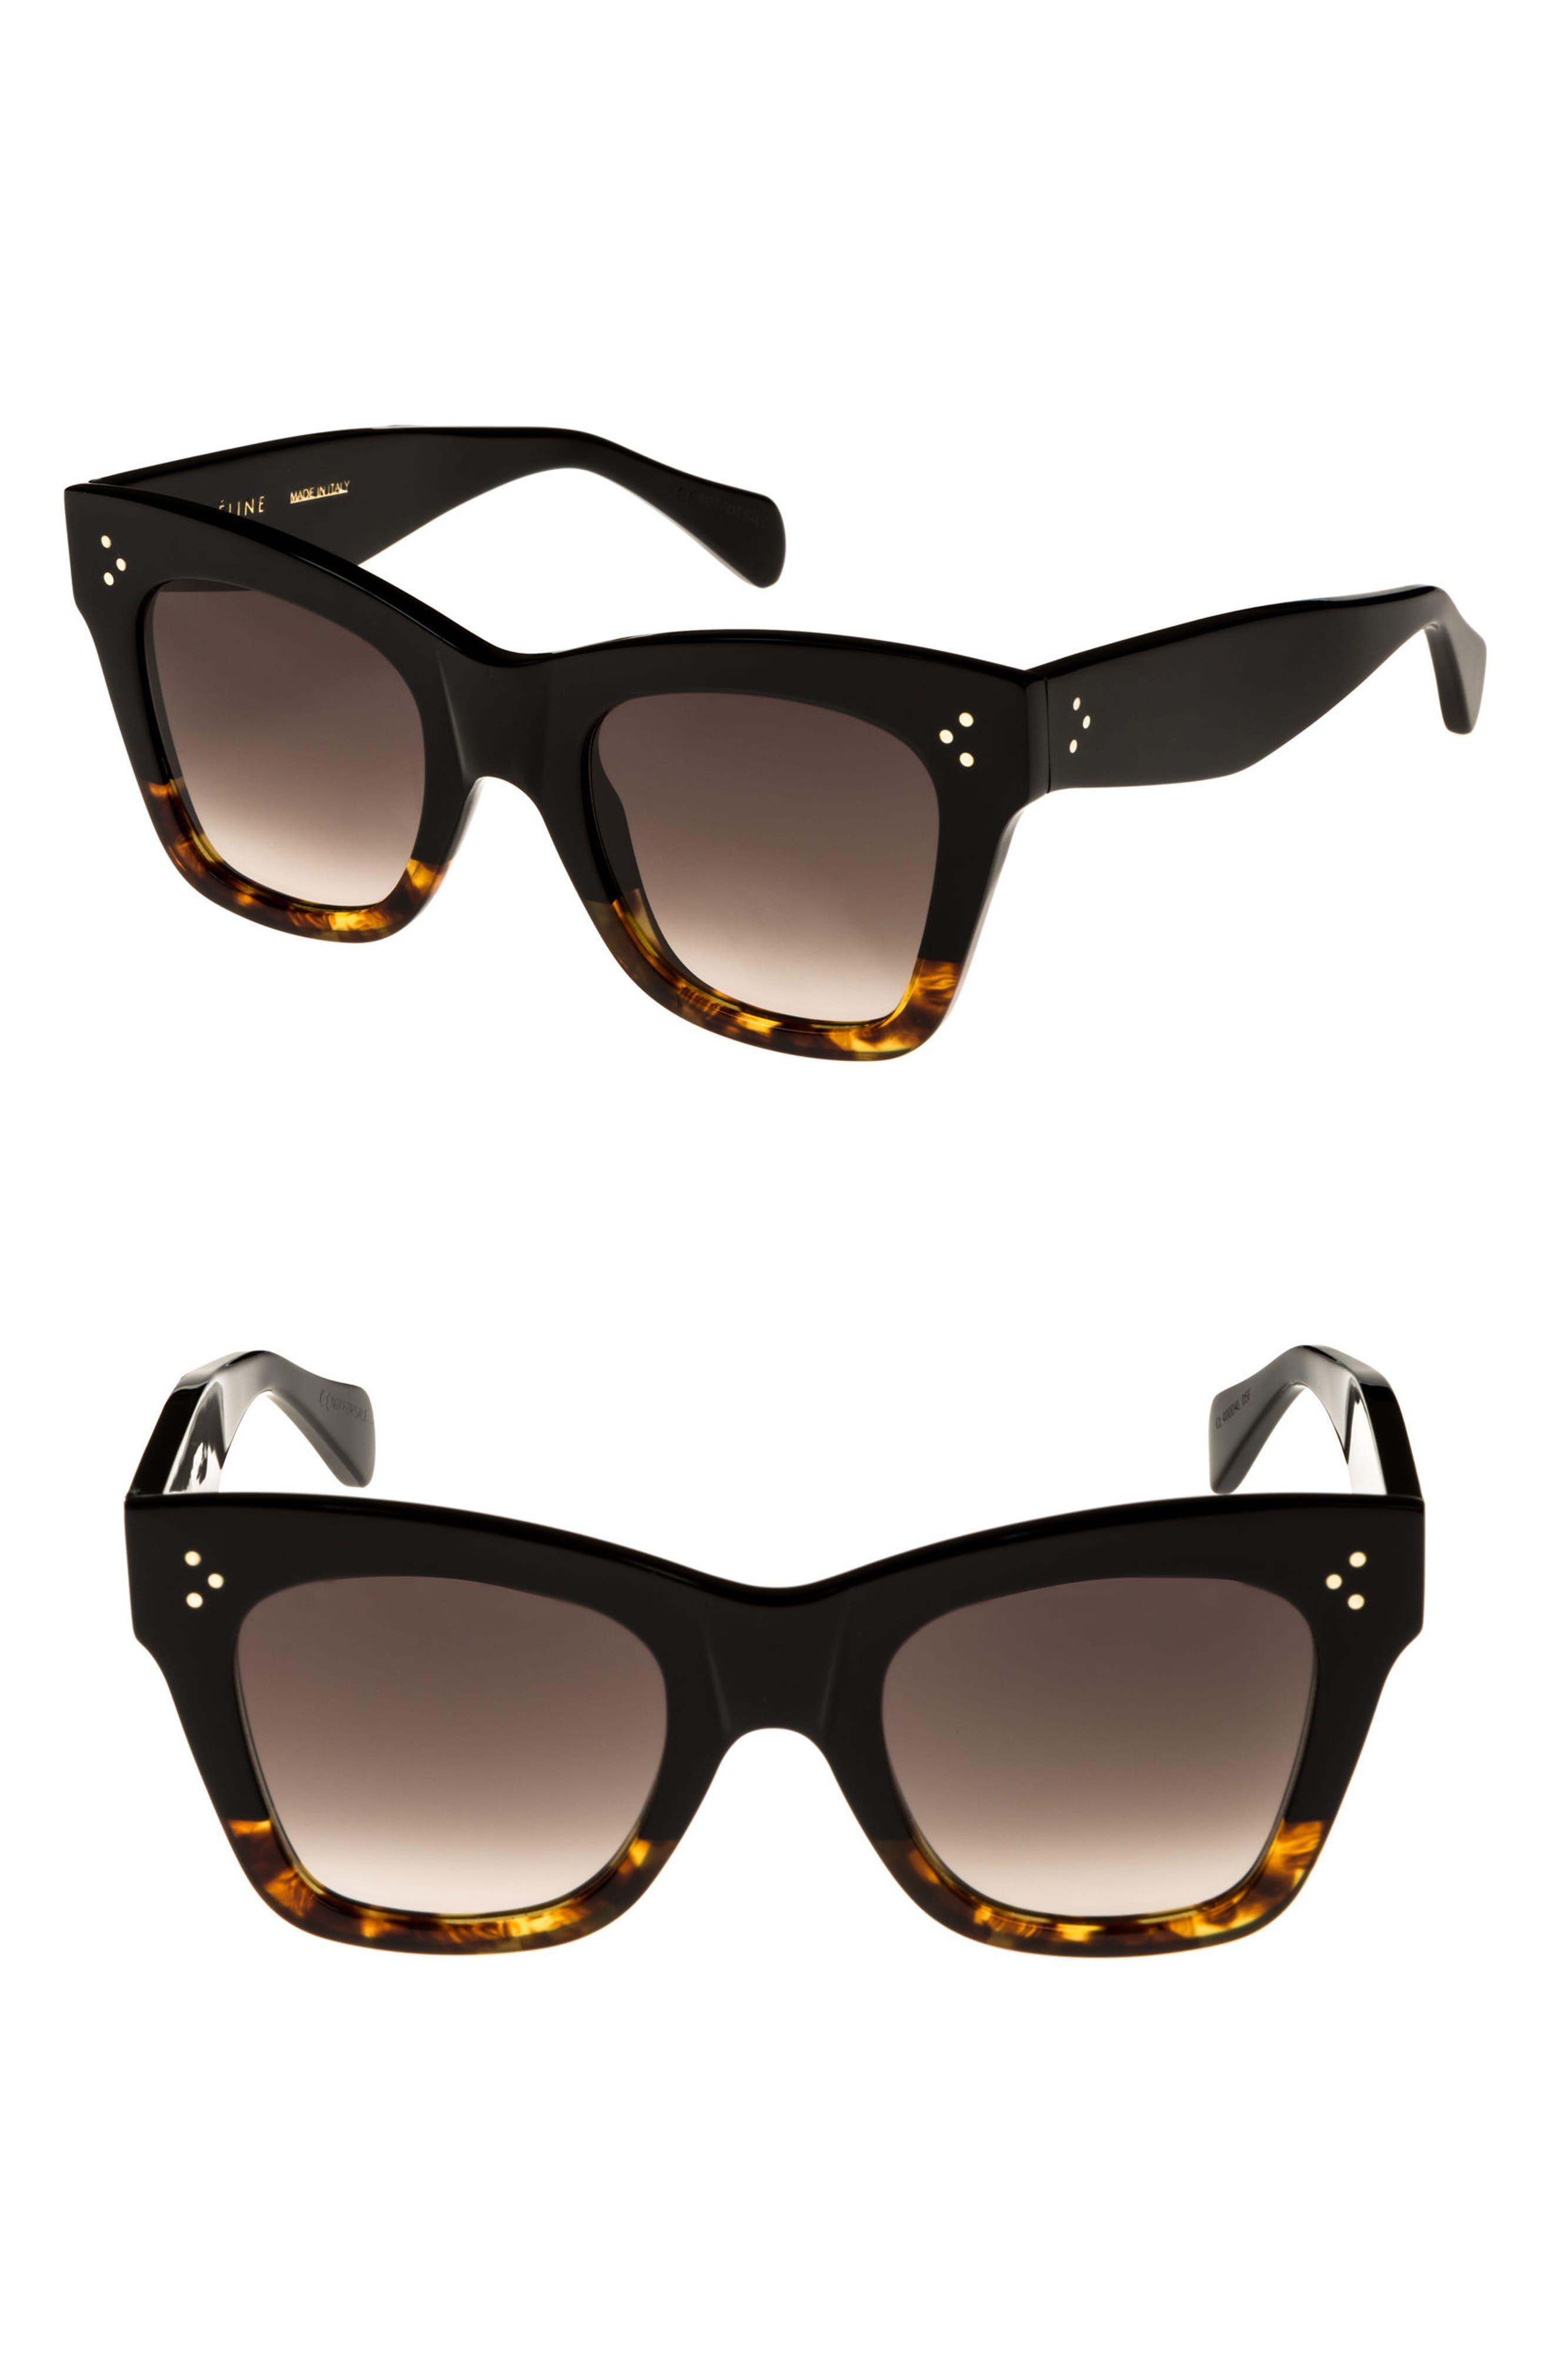 Celine 50Mm Gradient Butterfly Sunglasses - Black/ Havana